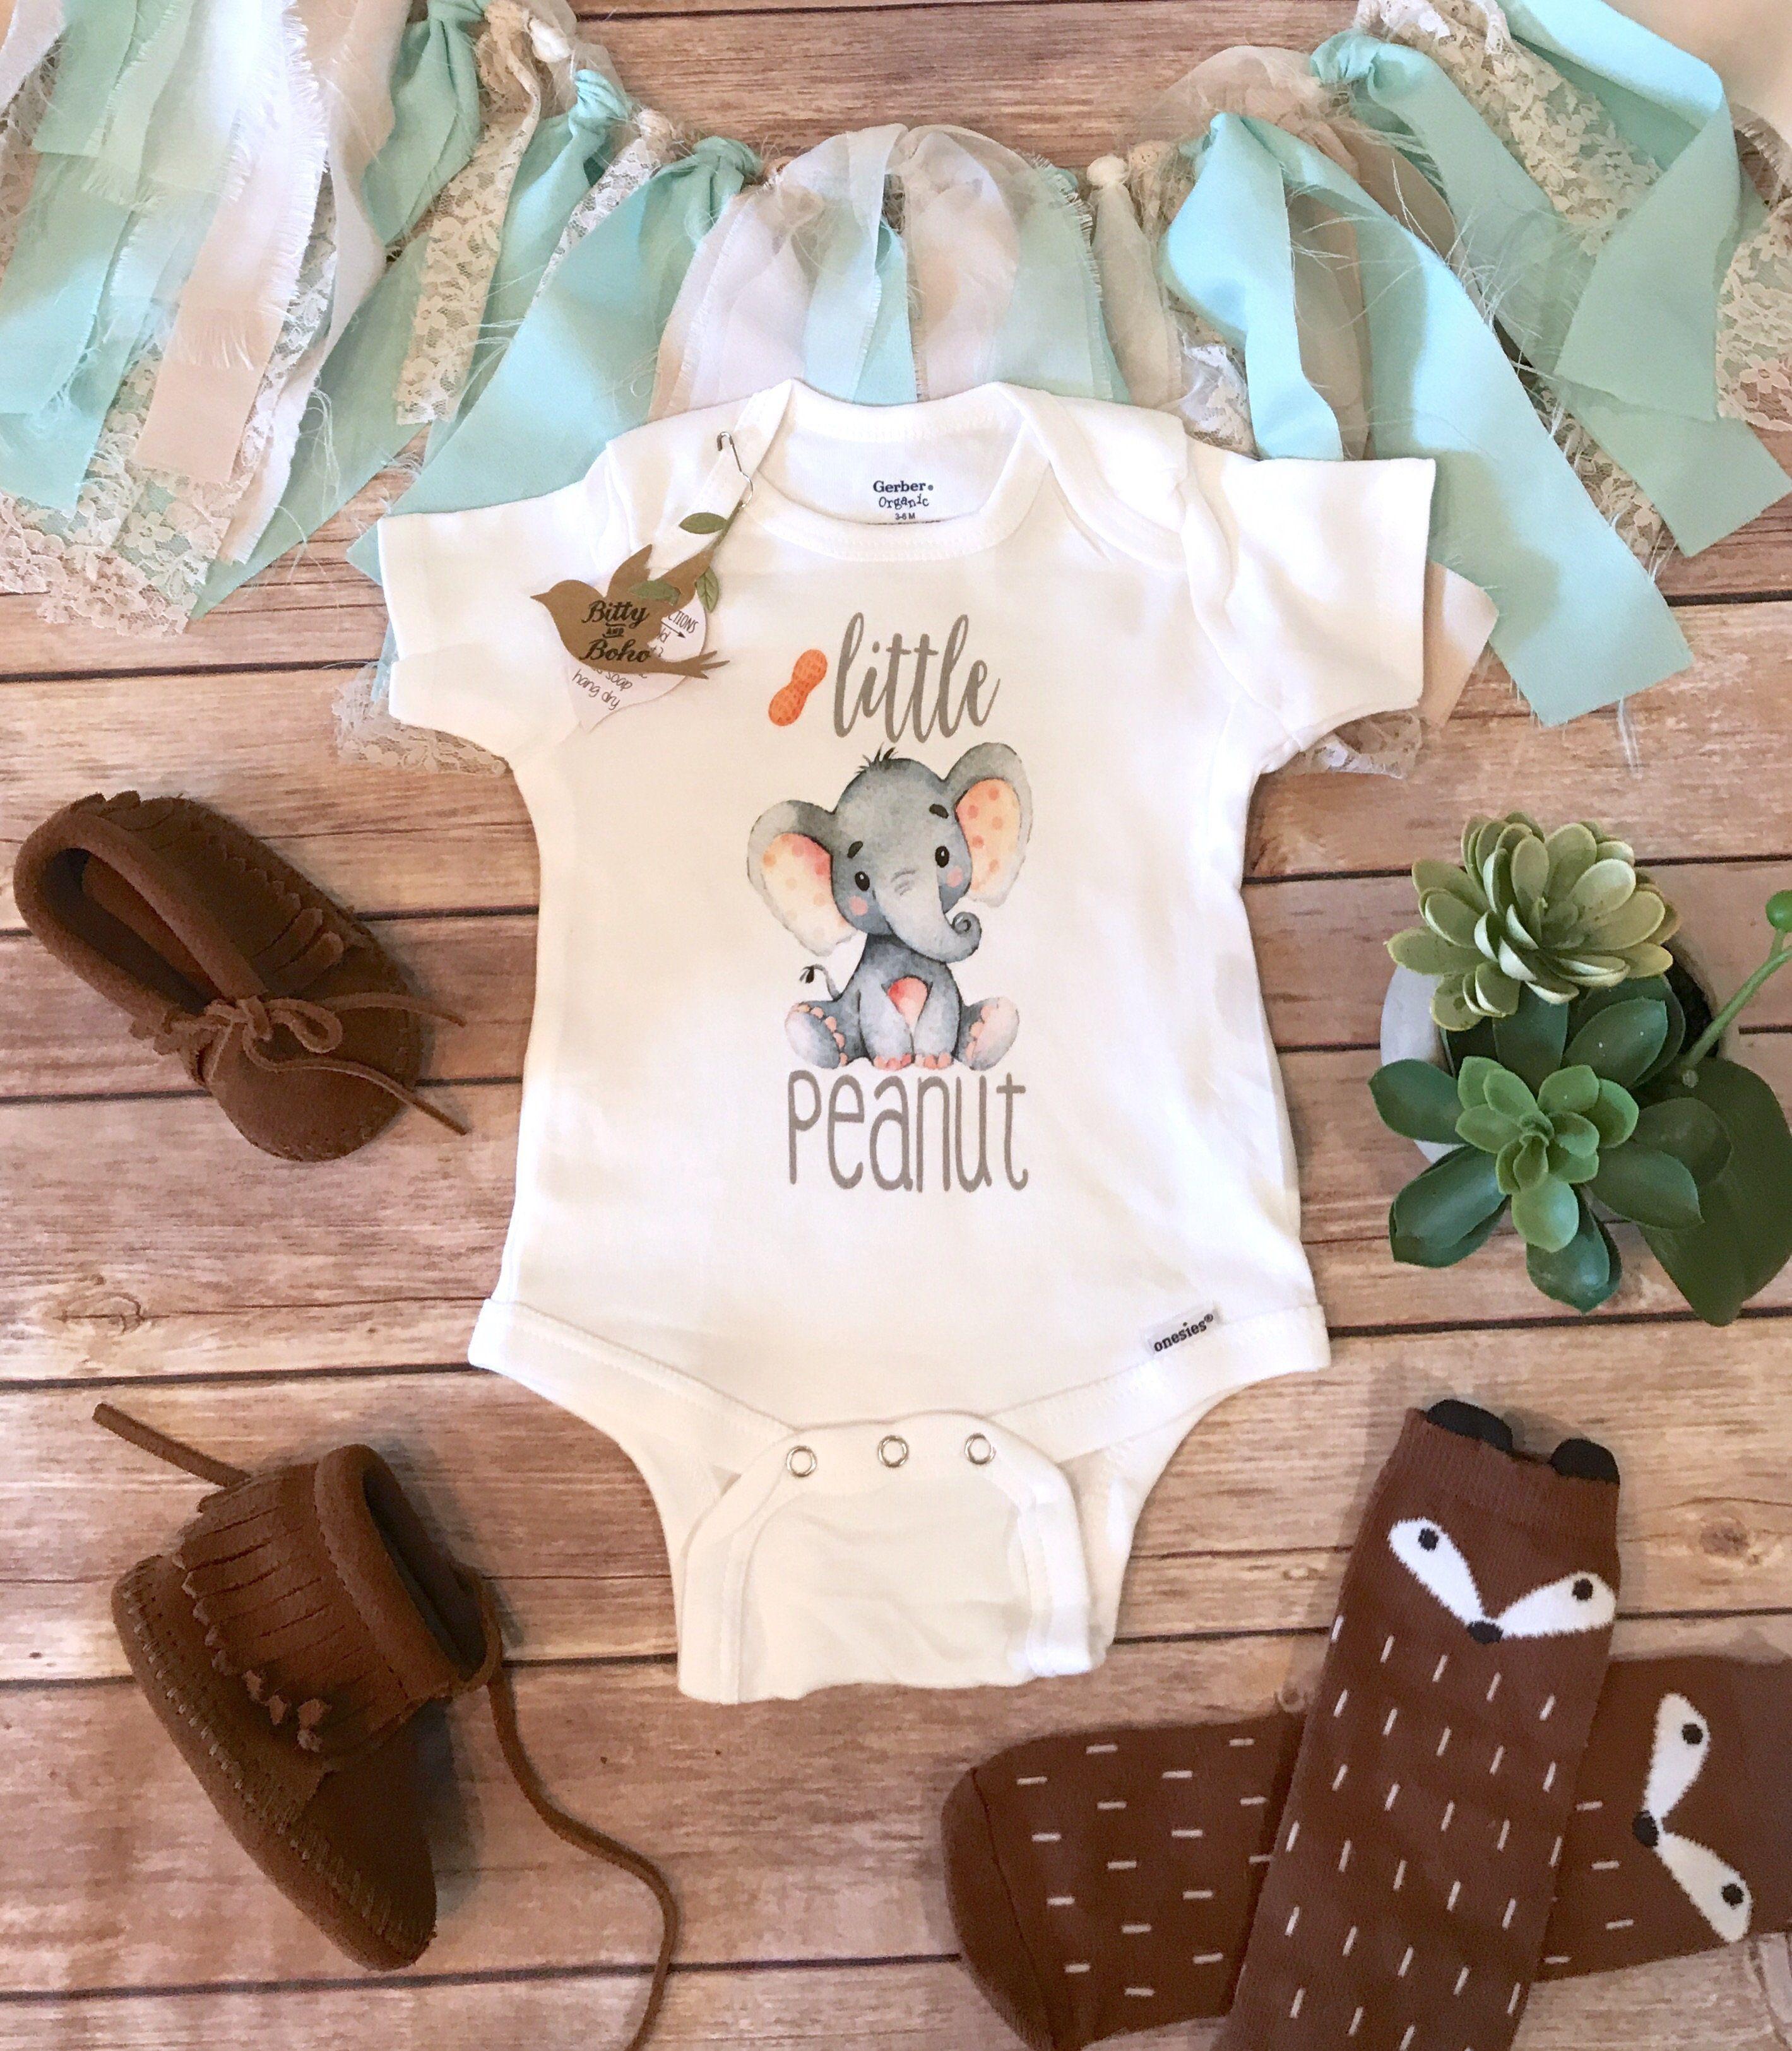 91c17014c Little Peanut Elephant Onesie®   Blotty   Boho baby clothes, Unisex ...